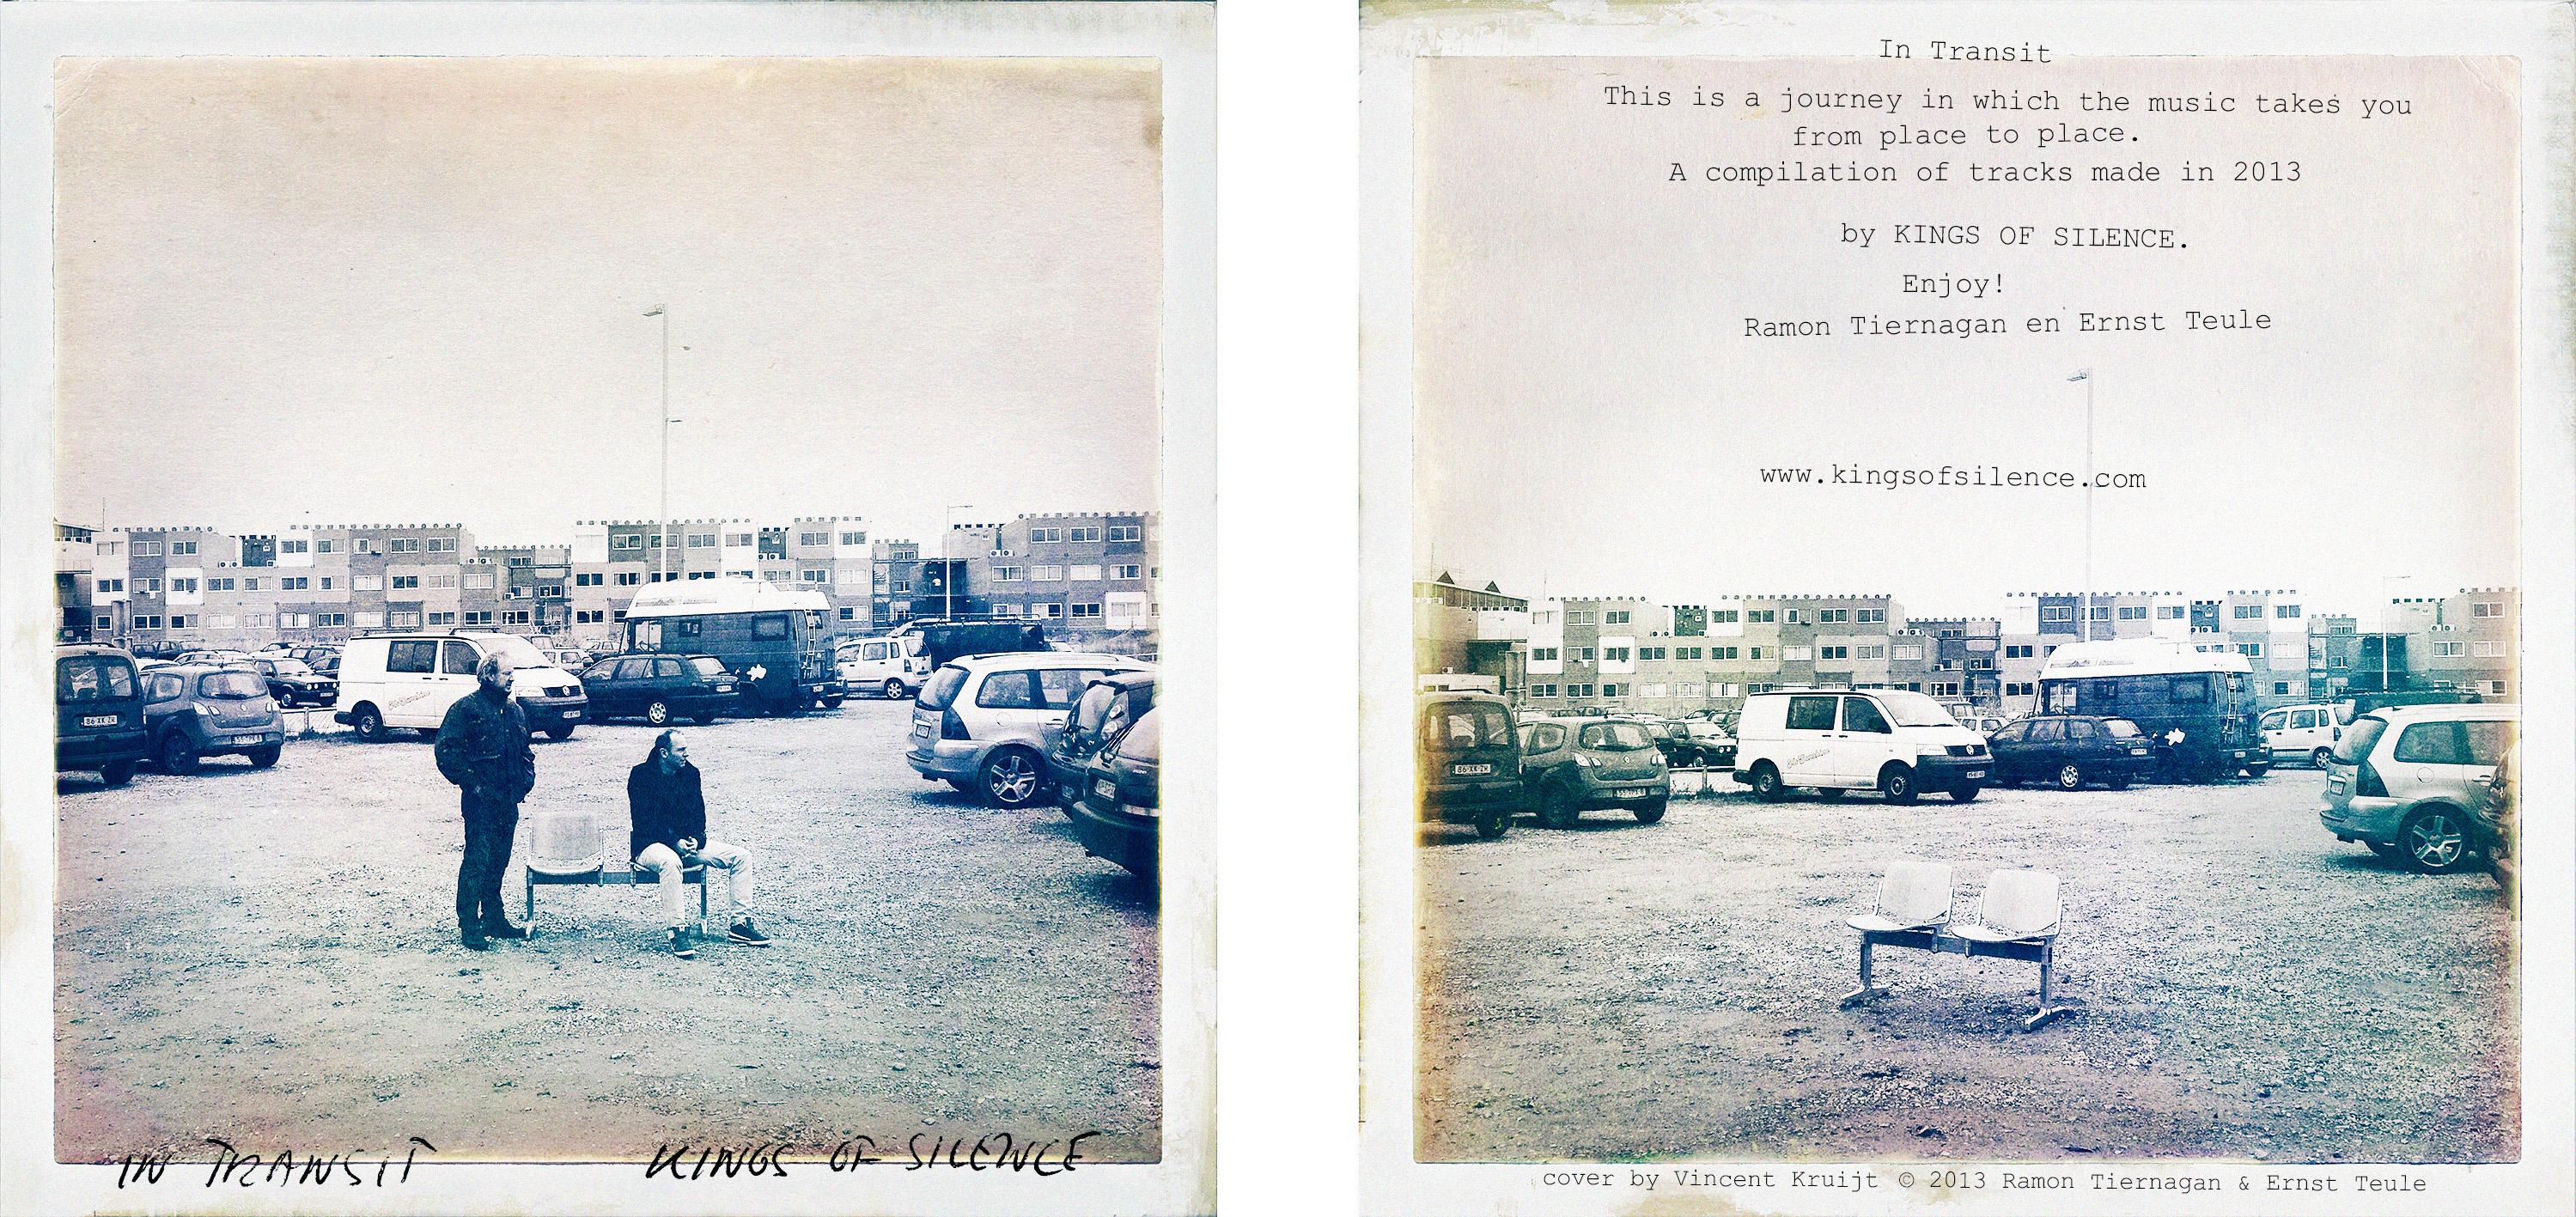 Kings Of Silence In Transit Vincent Kruijt